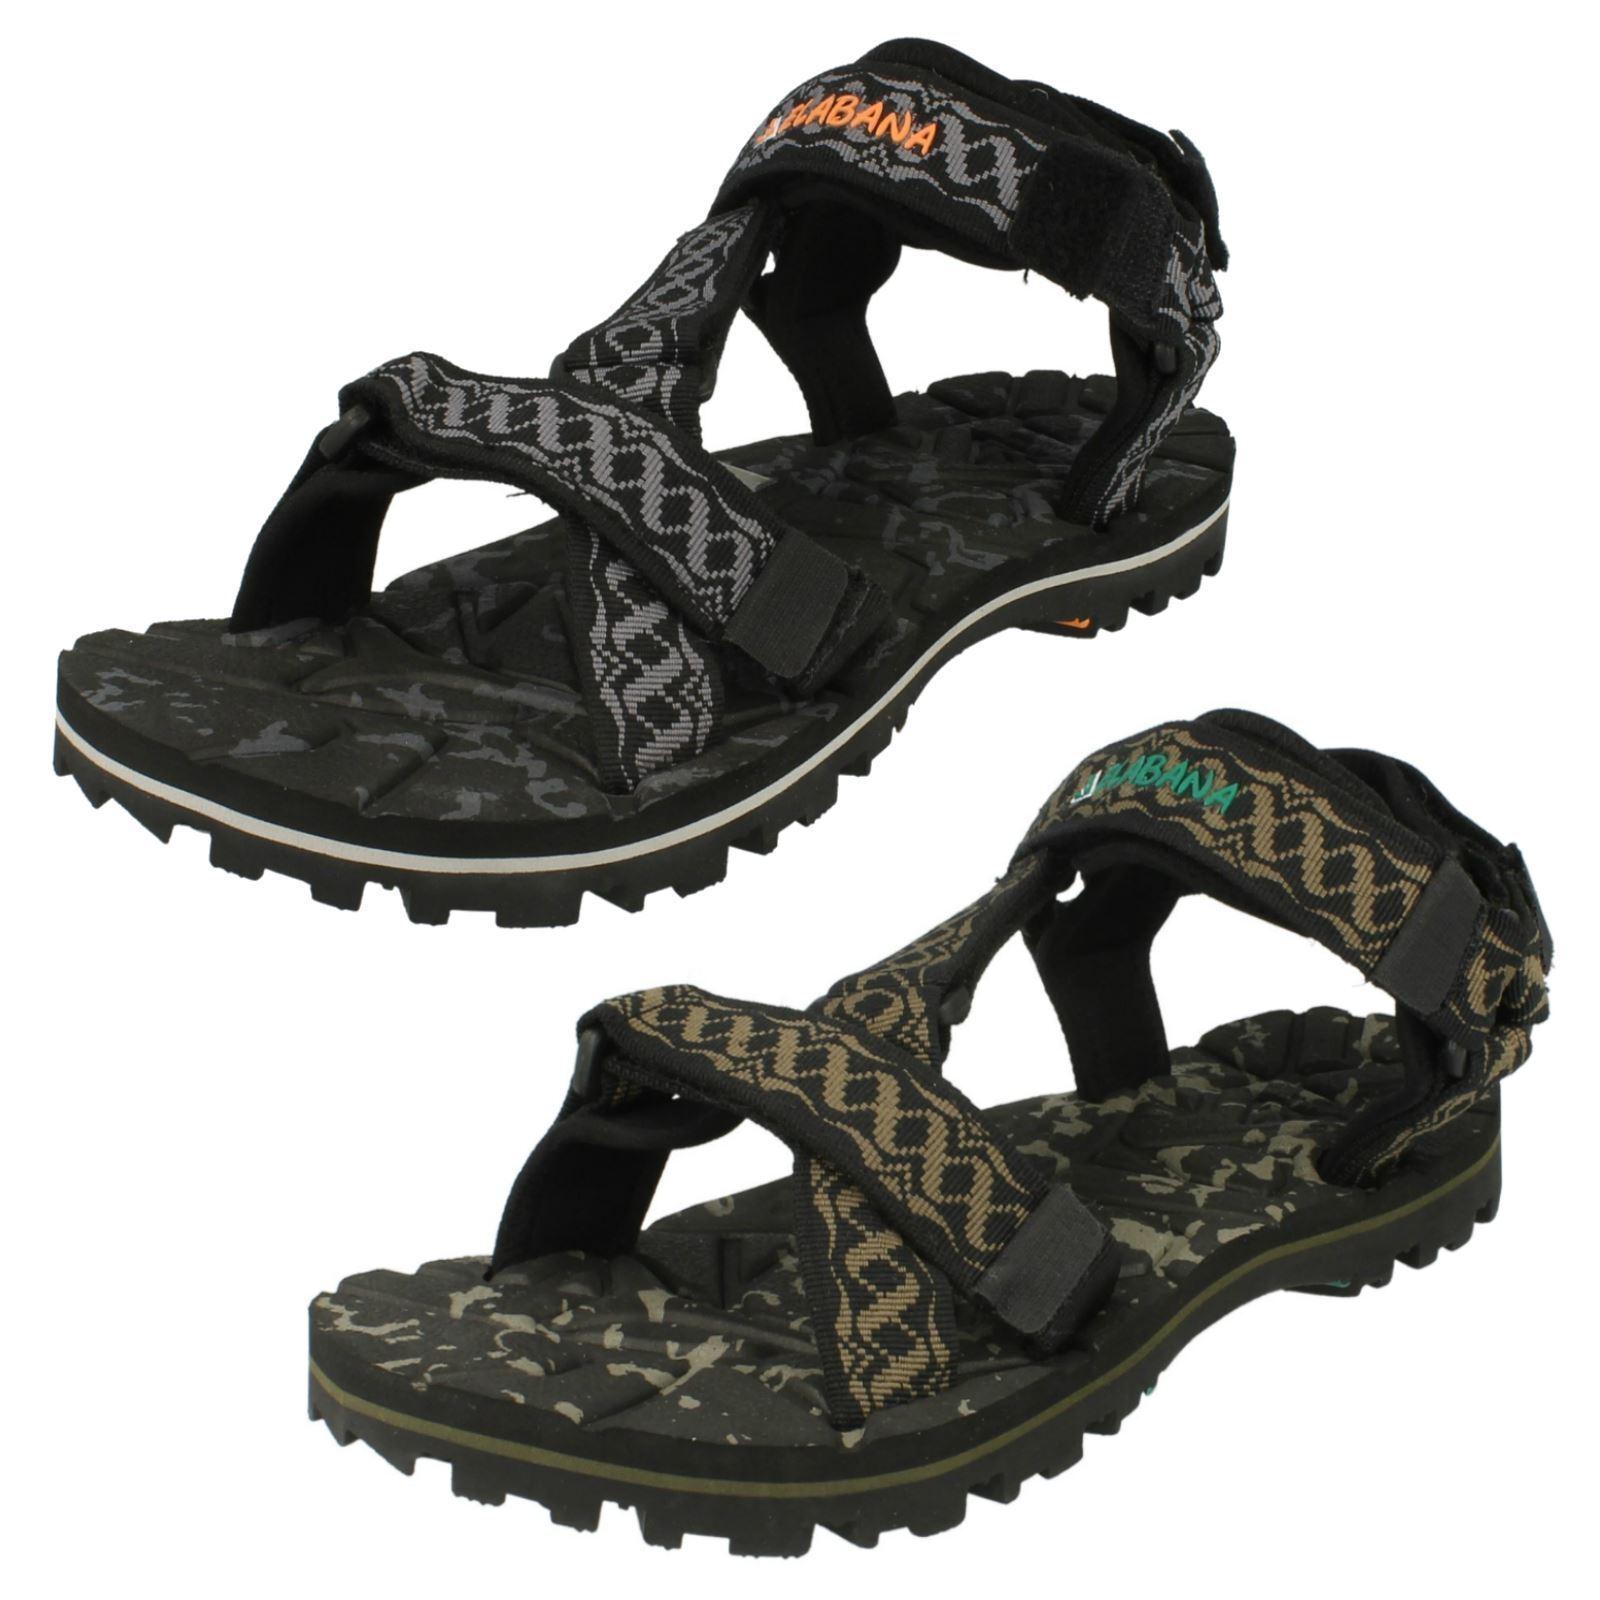 A0031 Hombre ELABANA OPEN TOE RIPTAPE FLAT FLAT FLAT CASUAL  BEACH Zapatos SUMMER SANDALS Talla bee00c